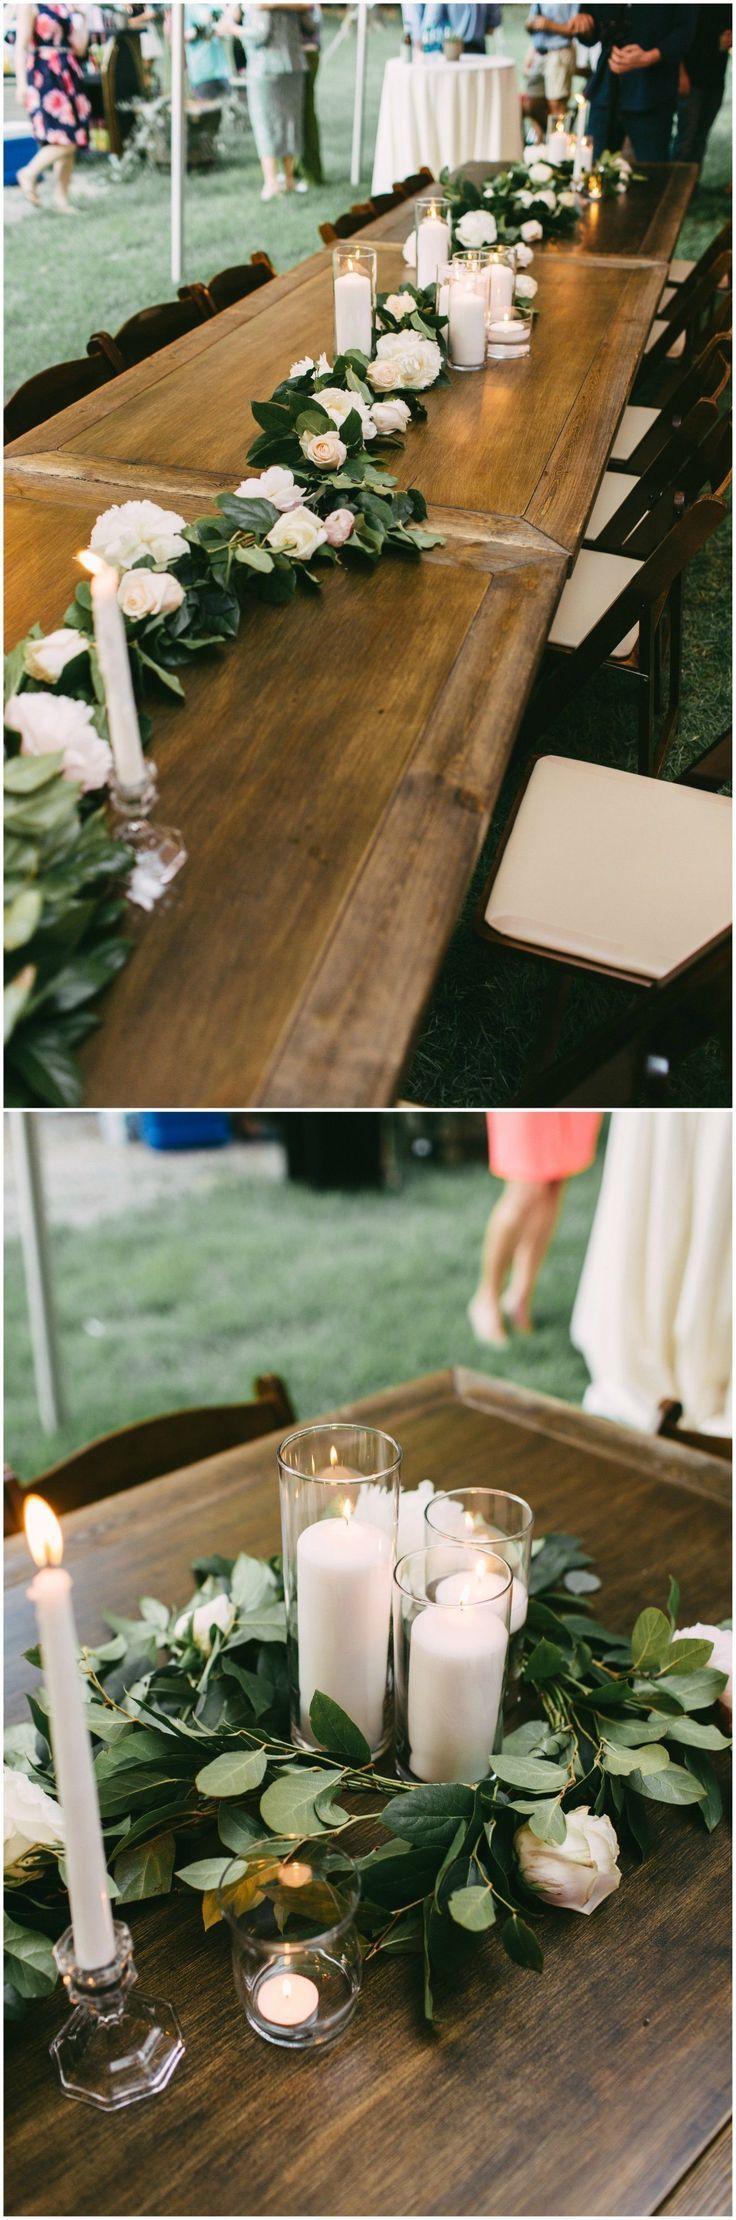 Outdoor Wedding Reception Table Decor Long Wooden Tables Garlands